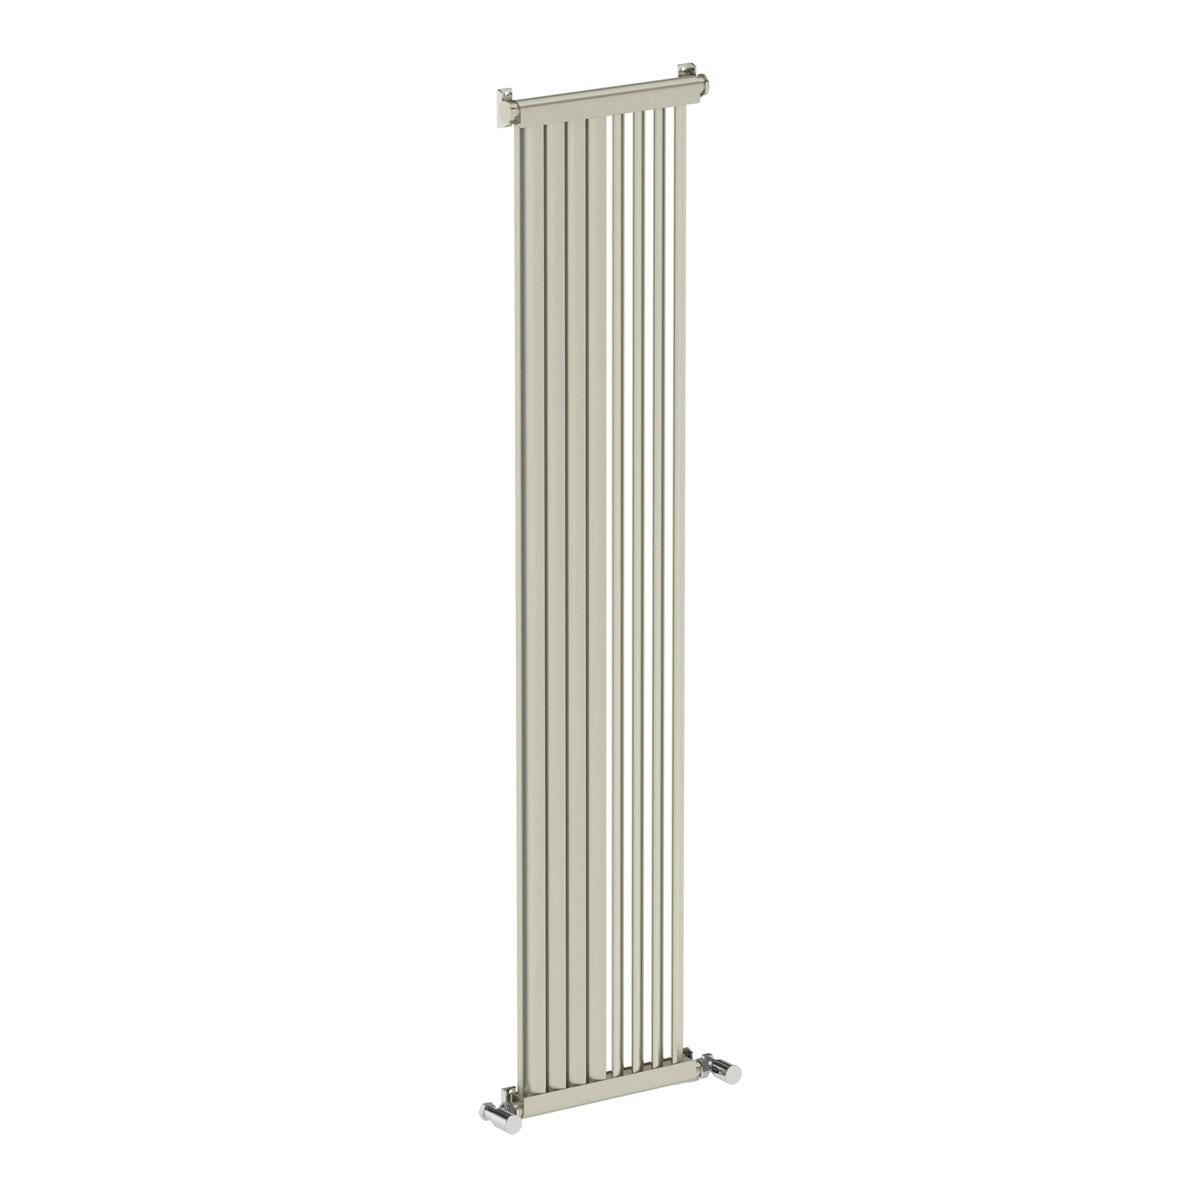 Mode Zephyra vertical radiator 1500 x 328